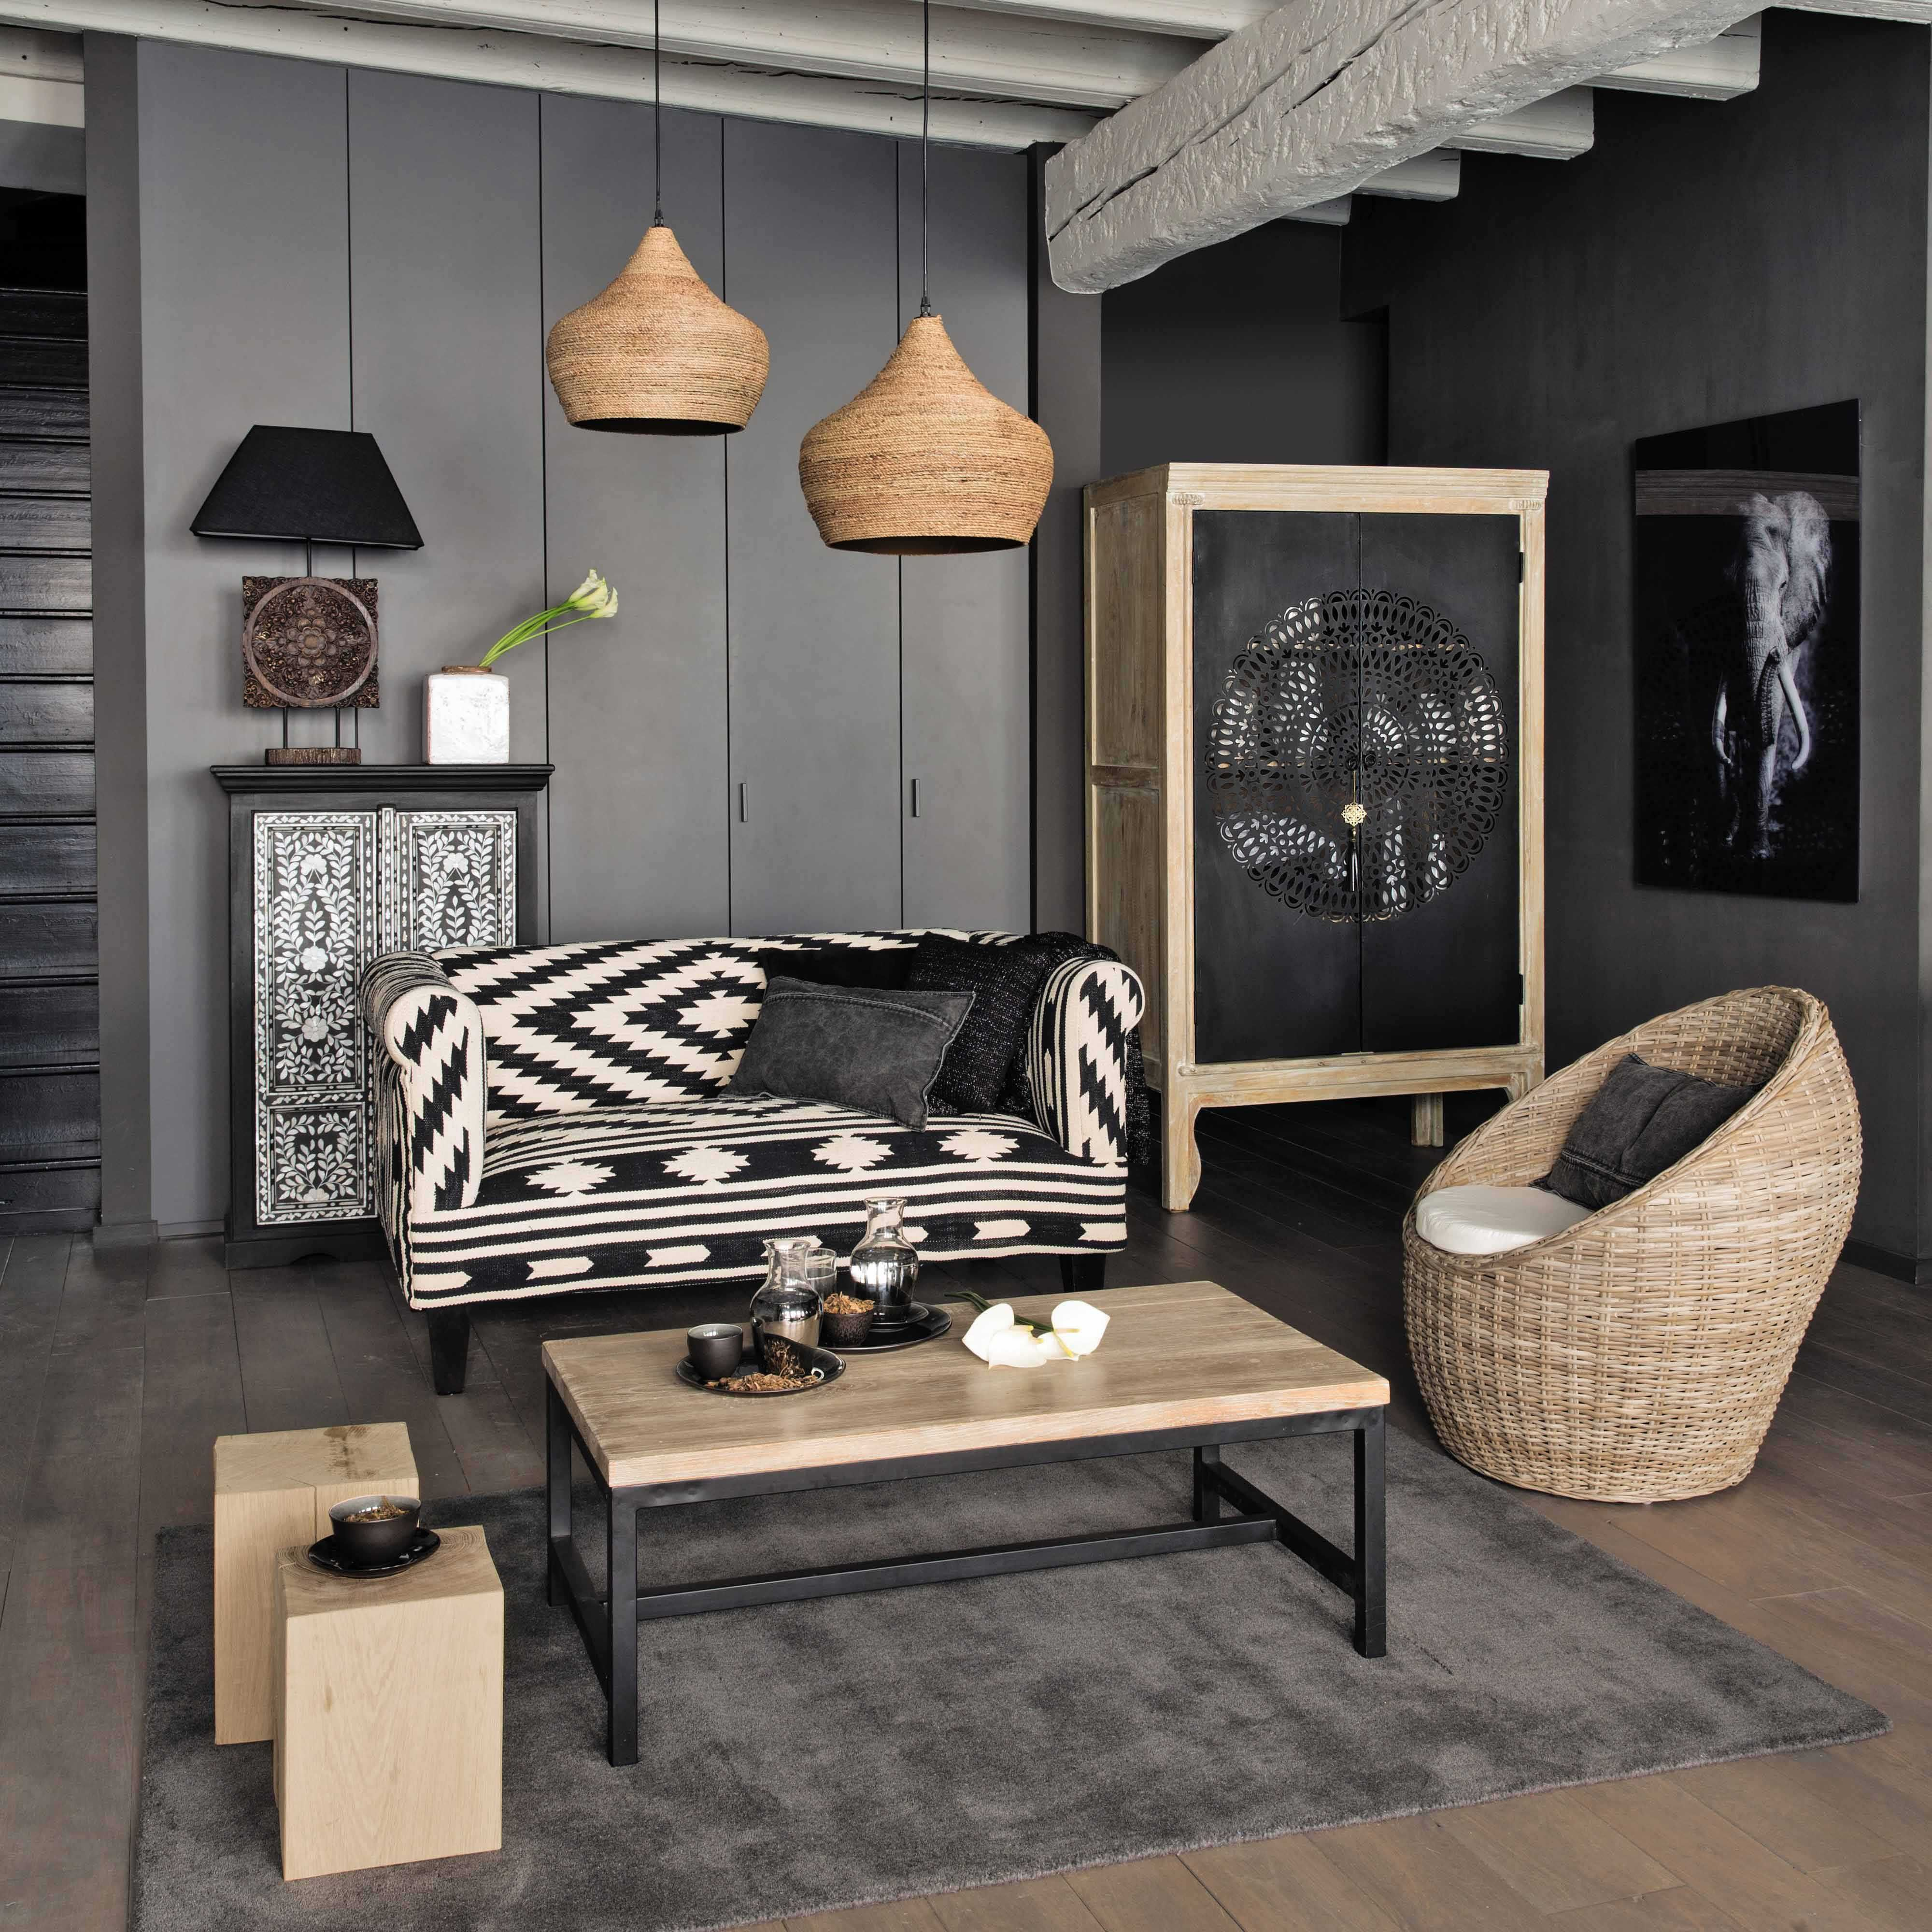 armoire en manguier massif gris e l 104 cm menara grey walls grey and armoires. Black Bedroom Furniture Sets. Home Design Ideas